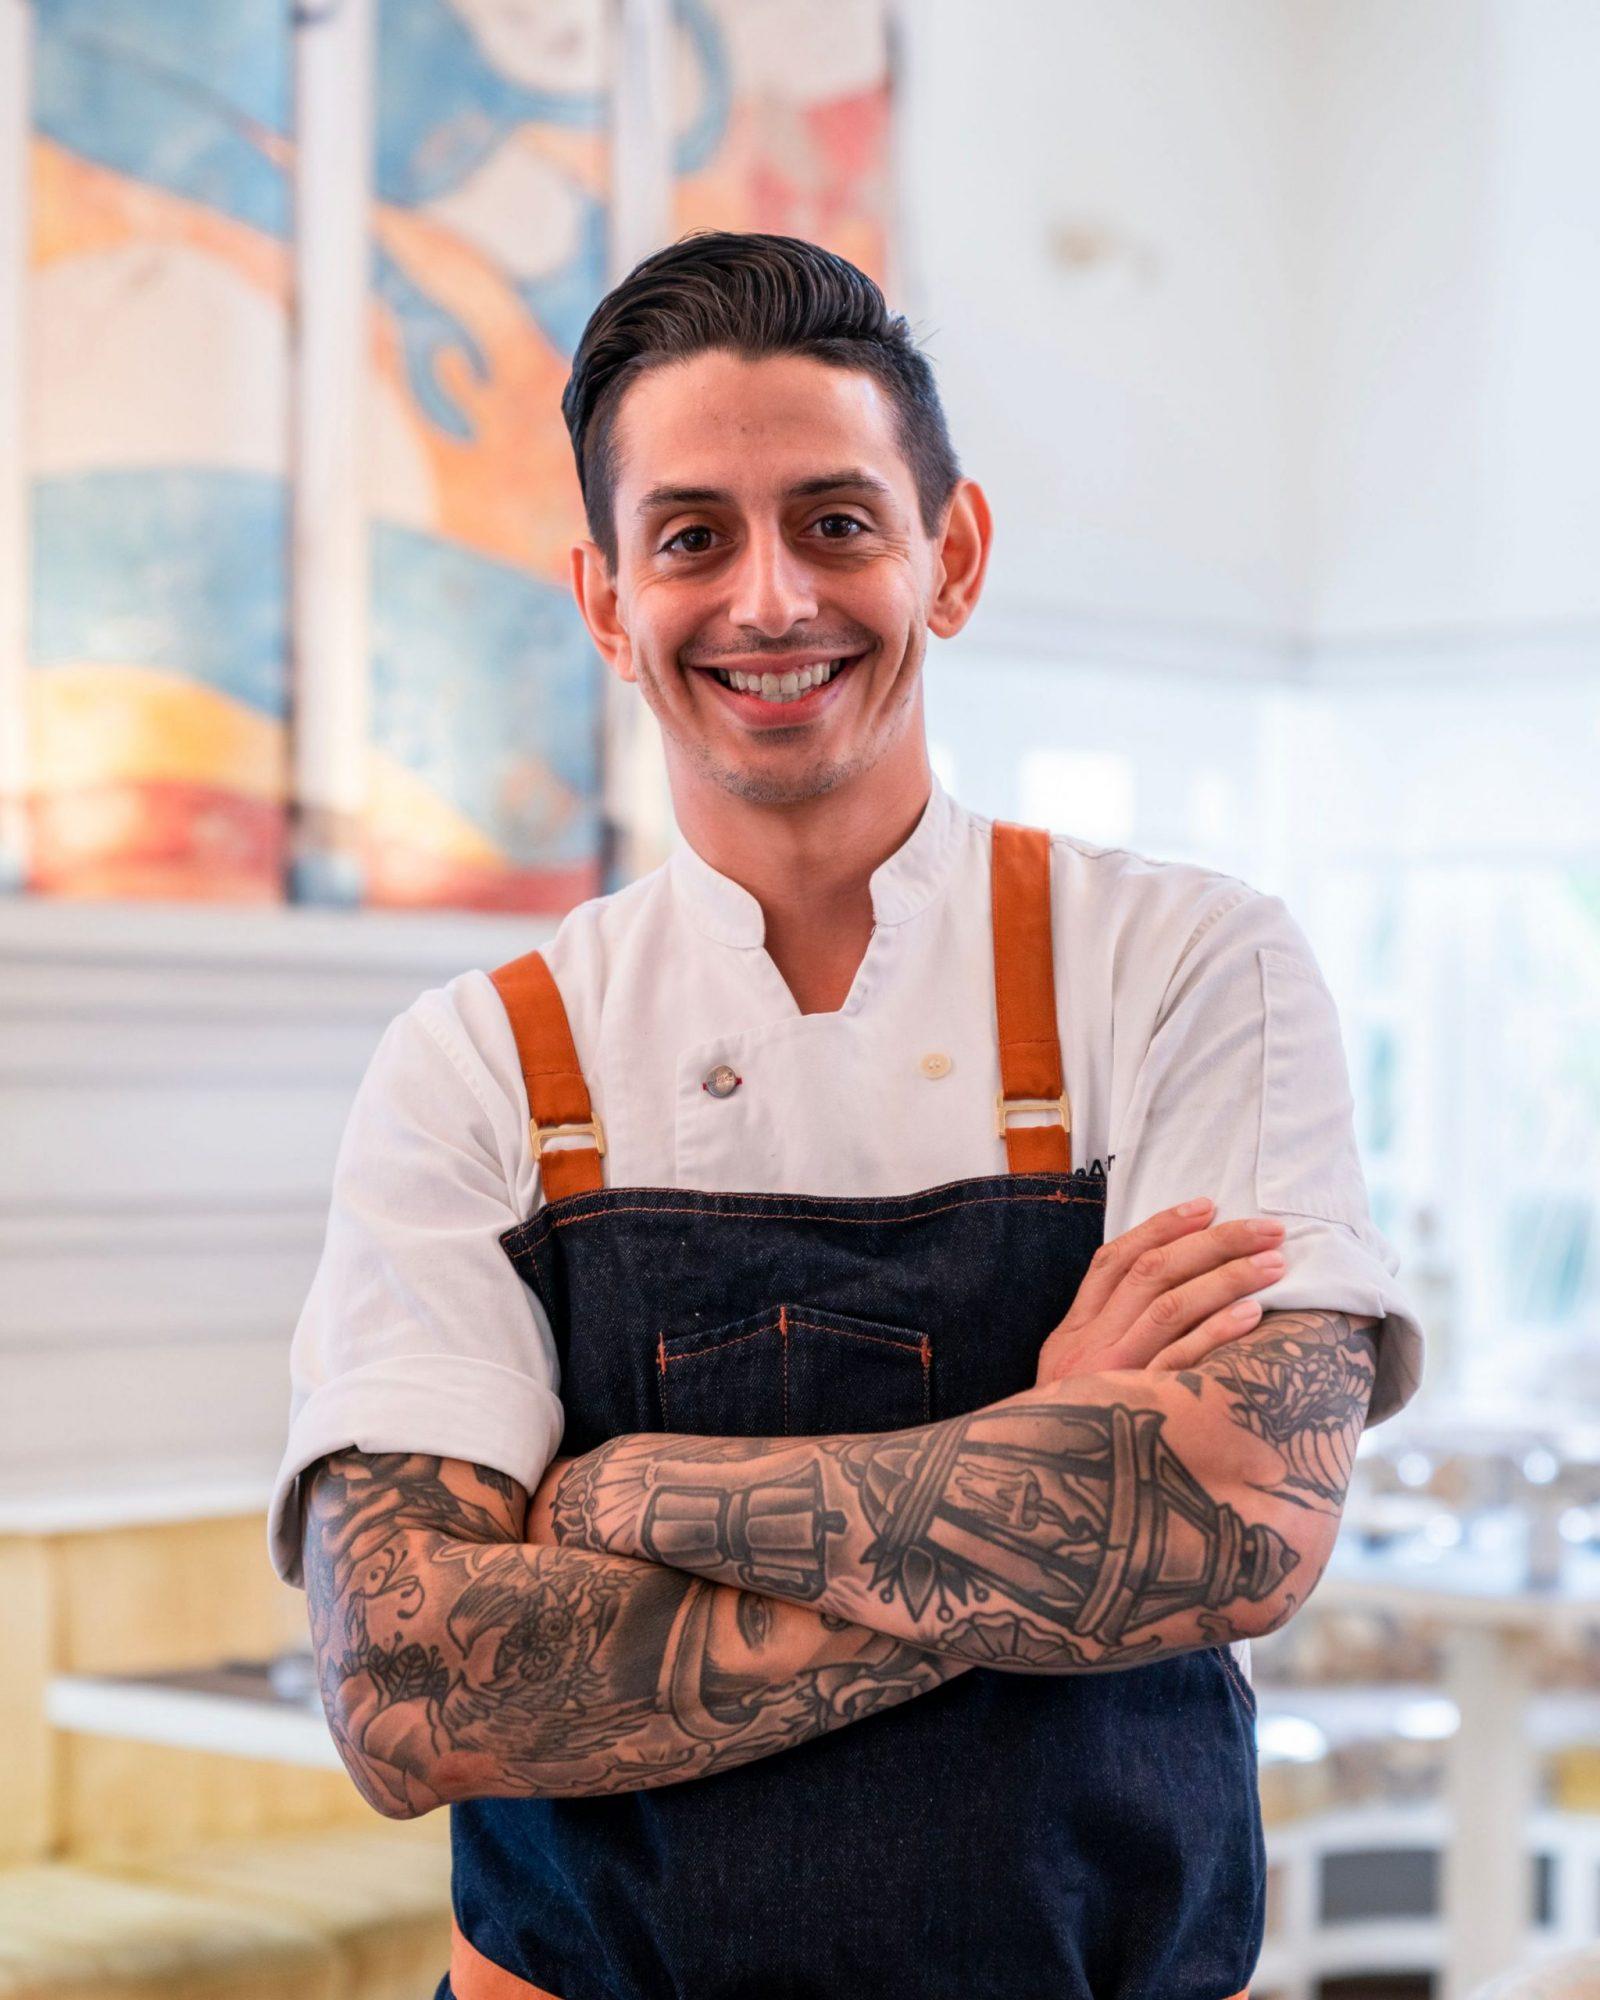 Byblos Miami Hosts Chef Collaboration Dinner with Osteria Morini